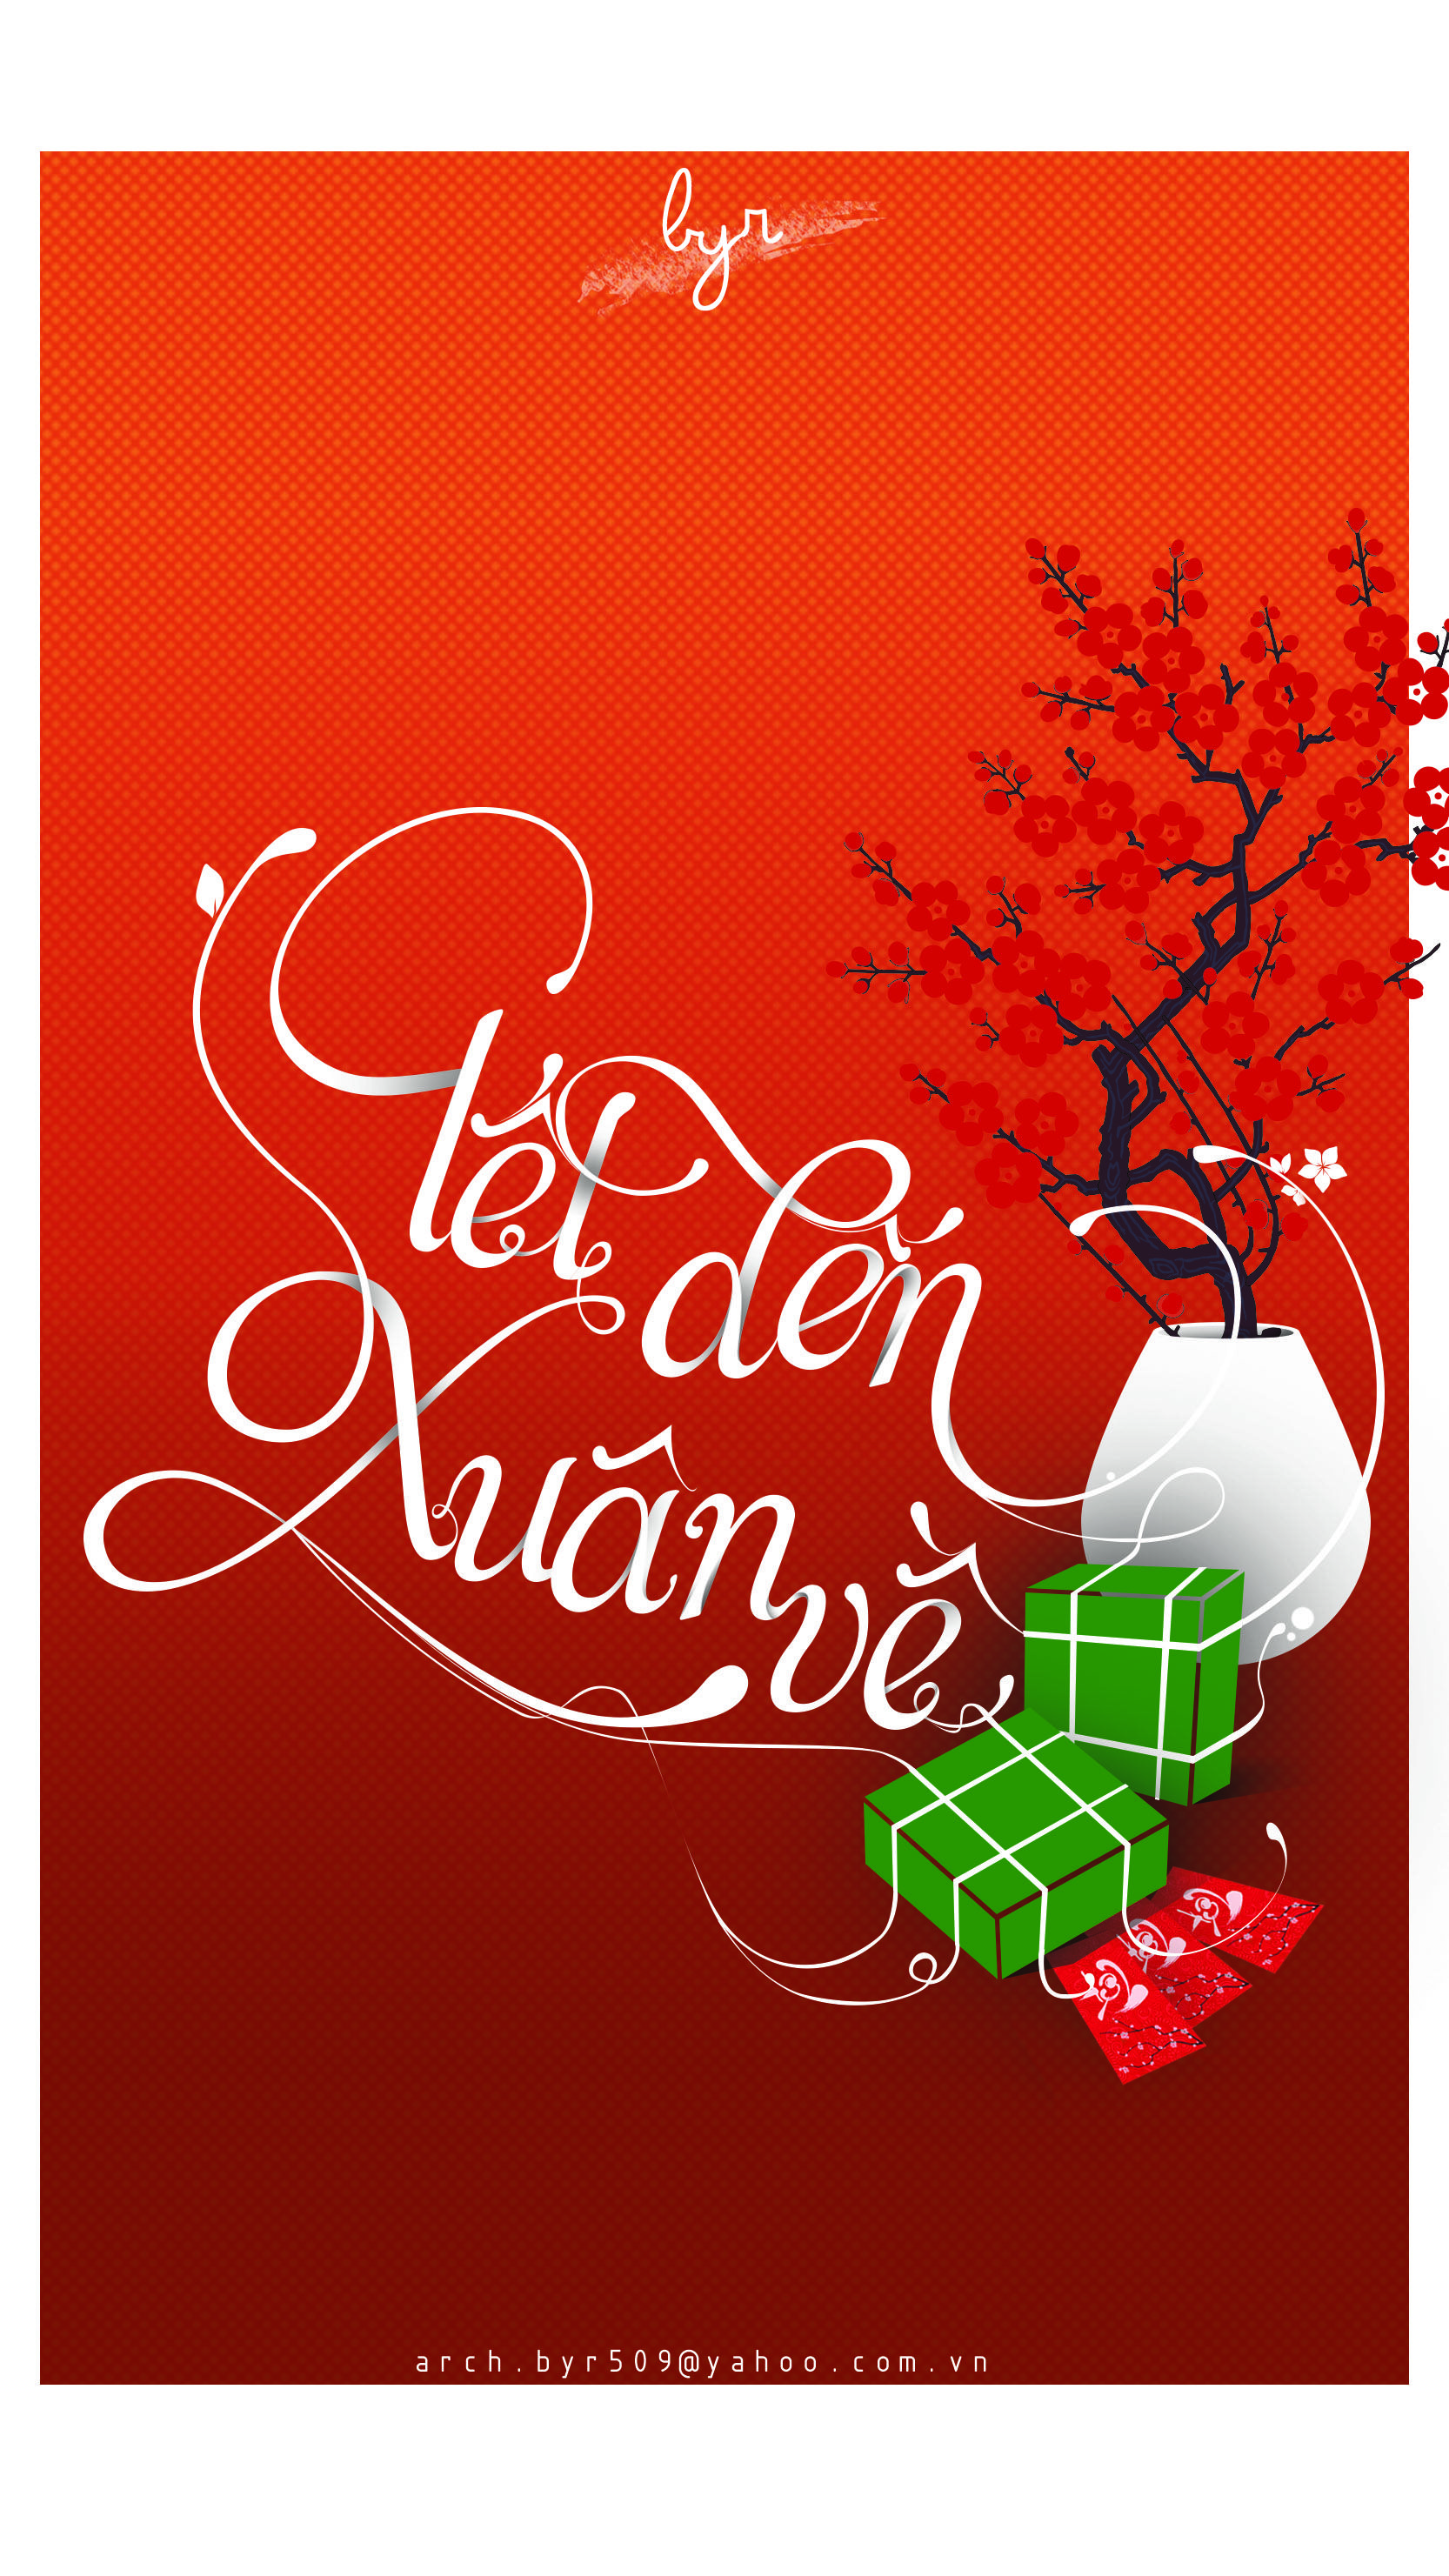 tt tt tt happy new year typo vietnam